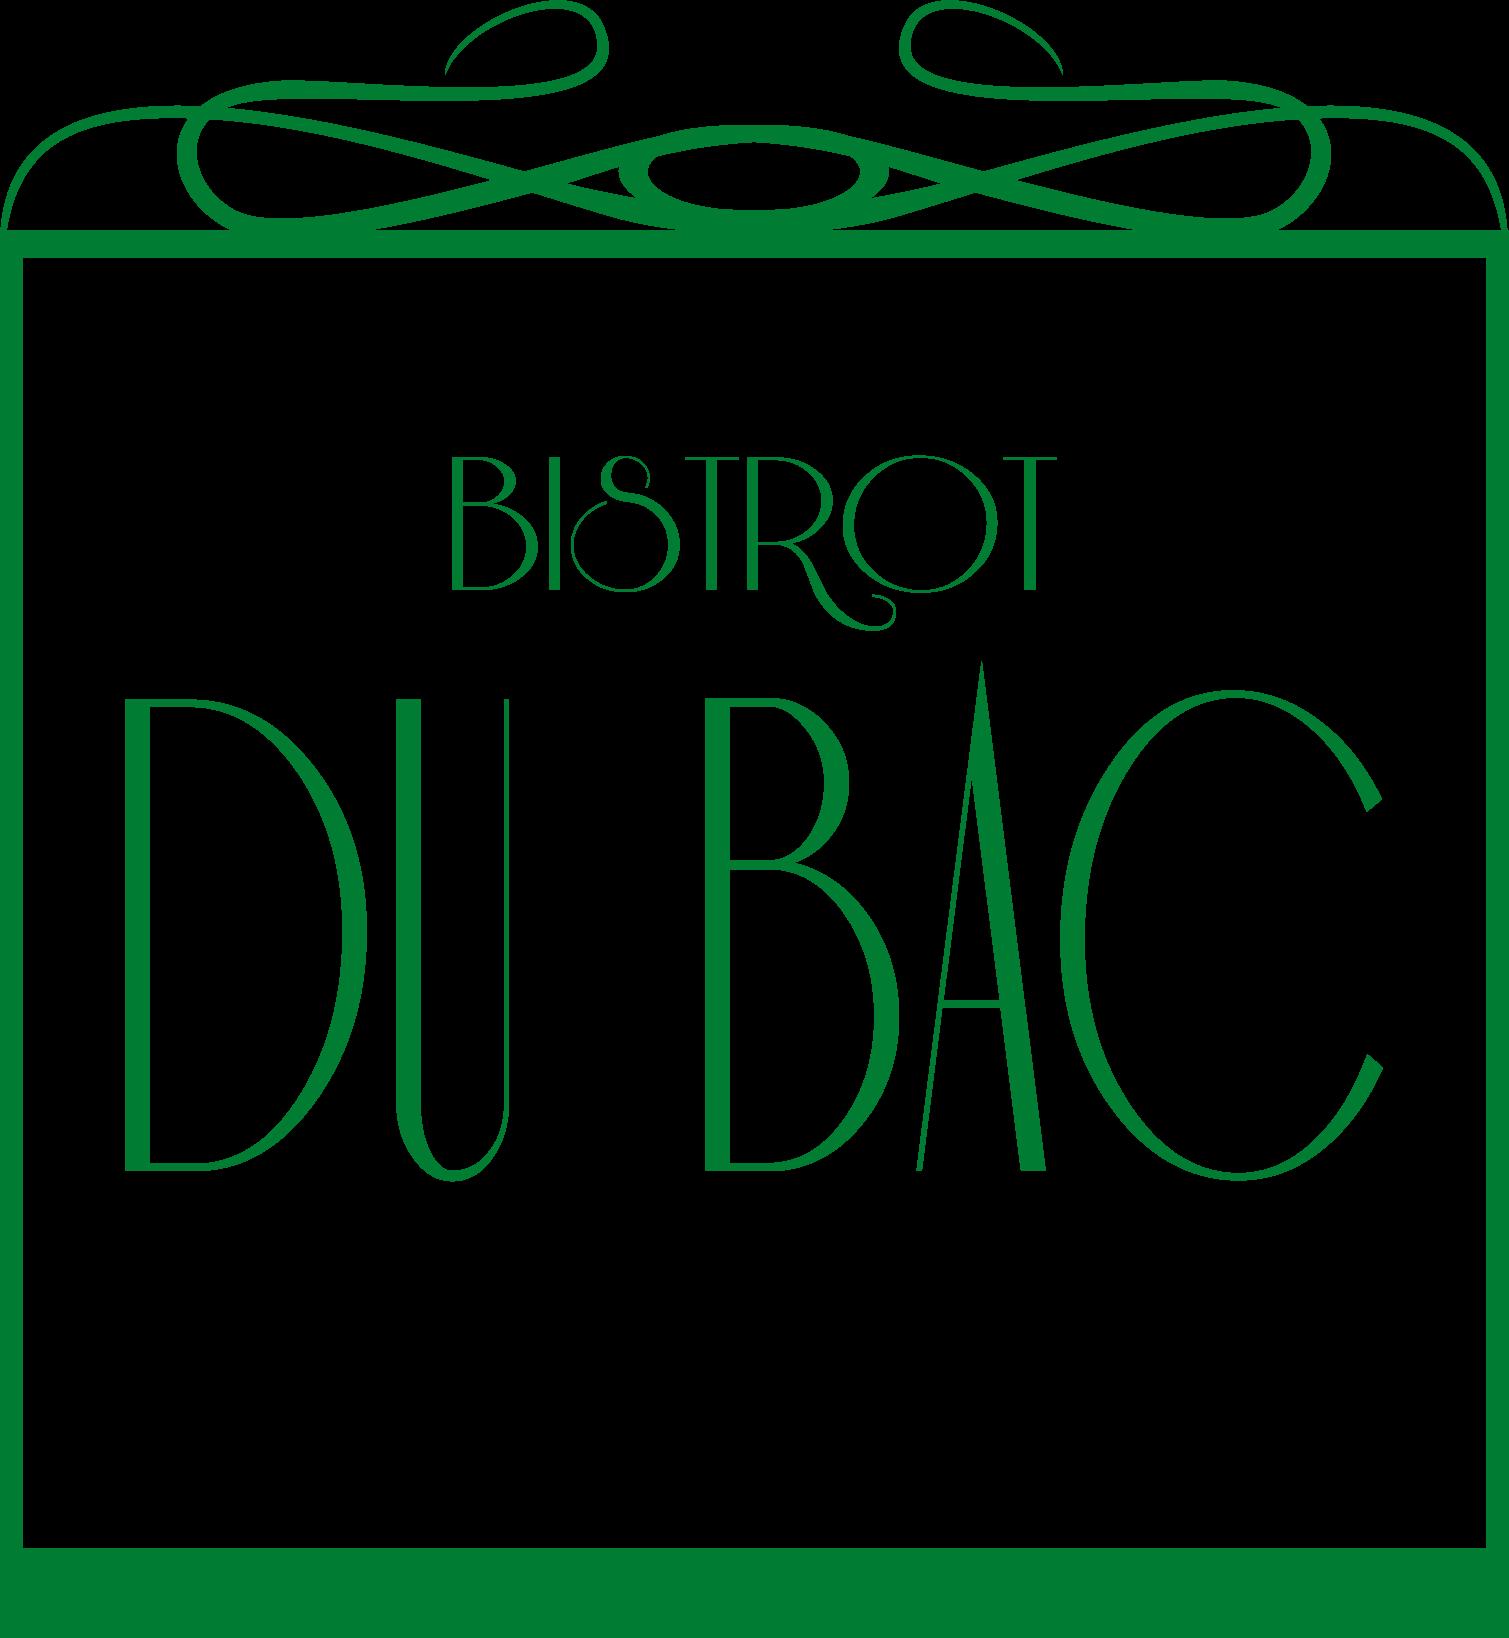 Logo dubac